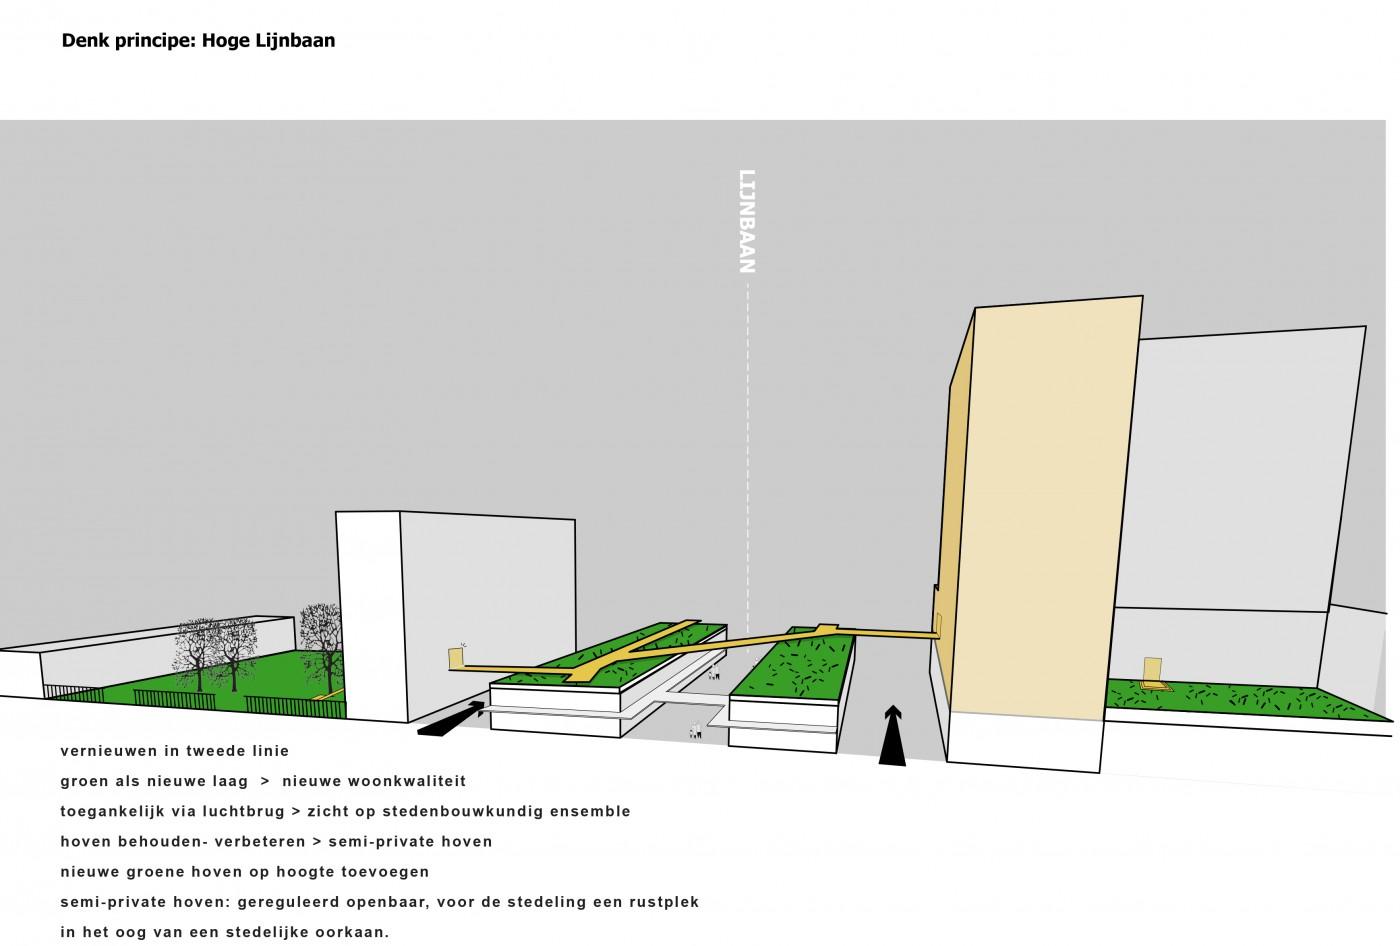 buro-sant-en-co-landschapsarchitectuur-licht-verdicht-lumiere-rotterdam-denk-principe